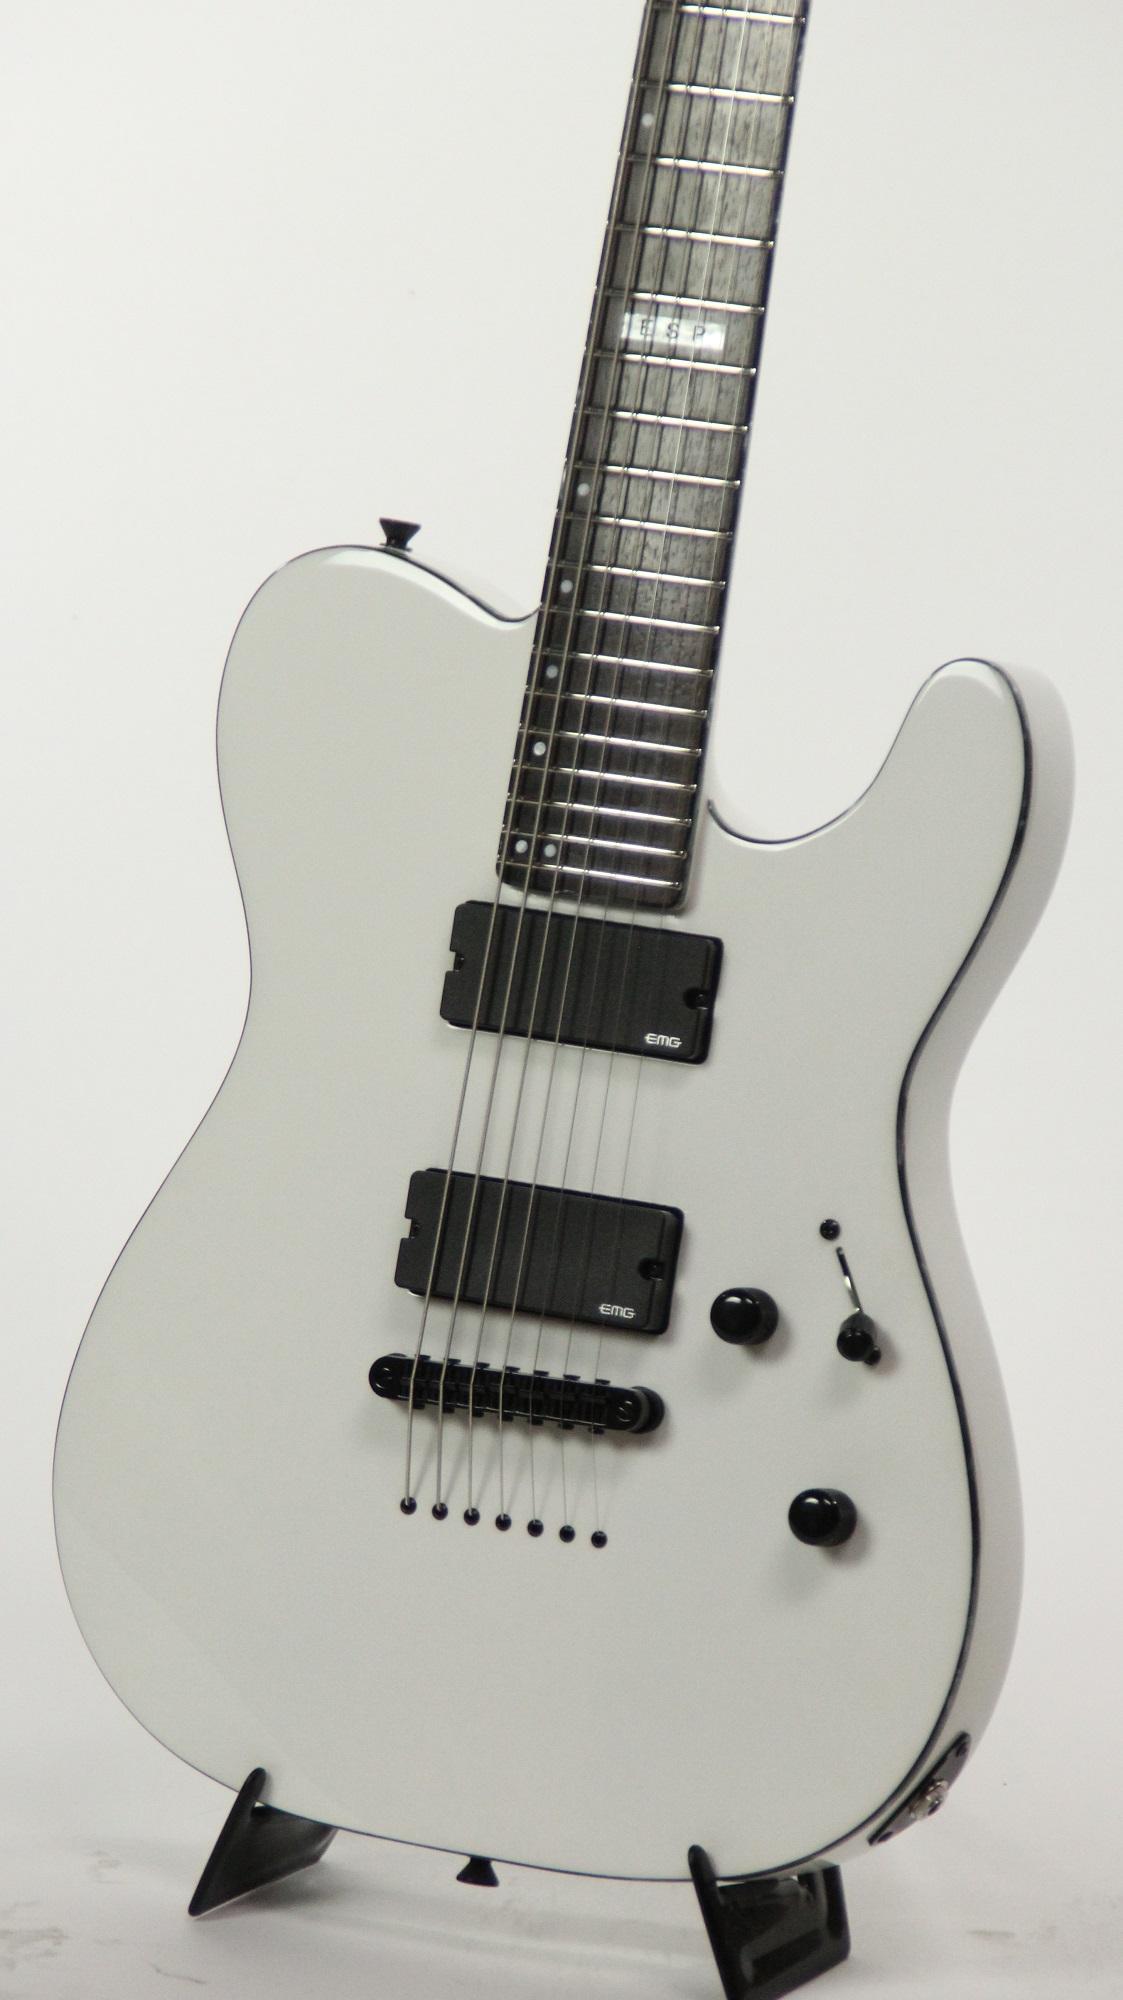 esp e ii te 7 tele snow white 7 string electric guitar w case ebay. Black Bedroom Furniture Sets. Home Design Ideas